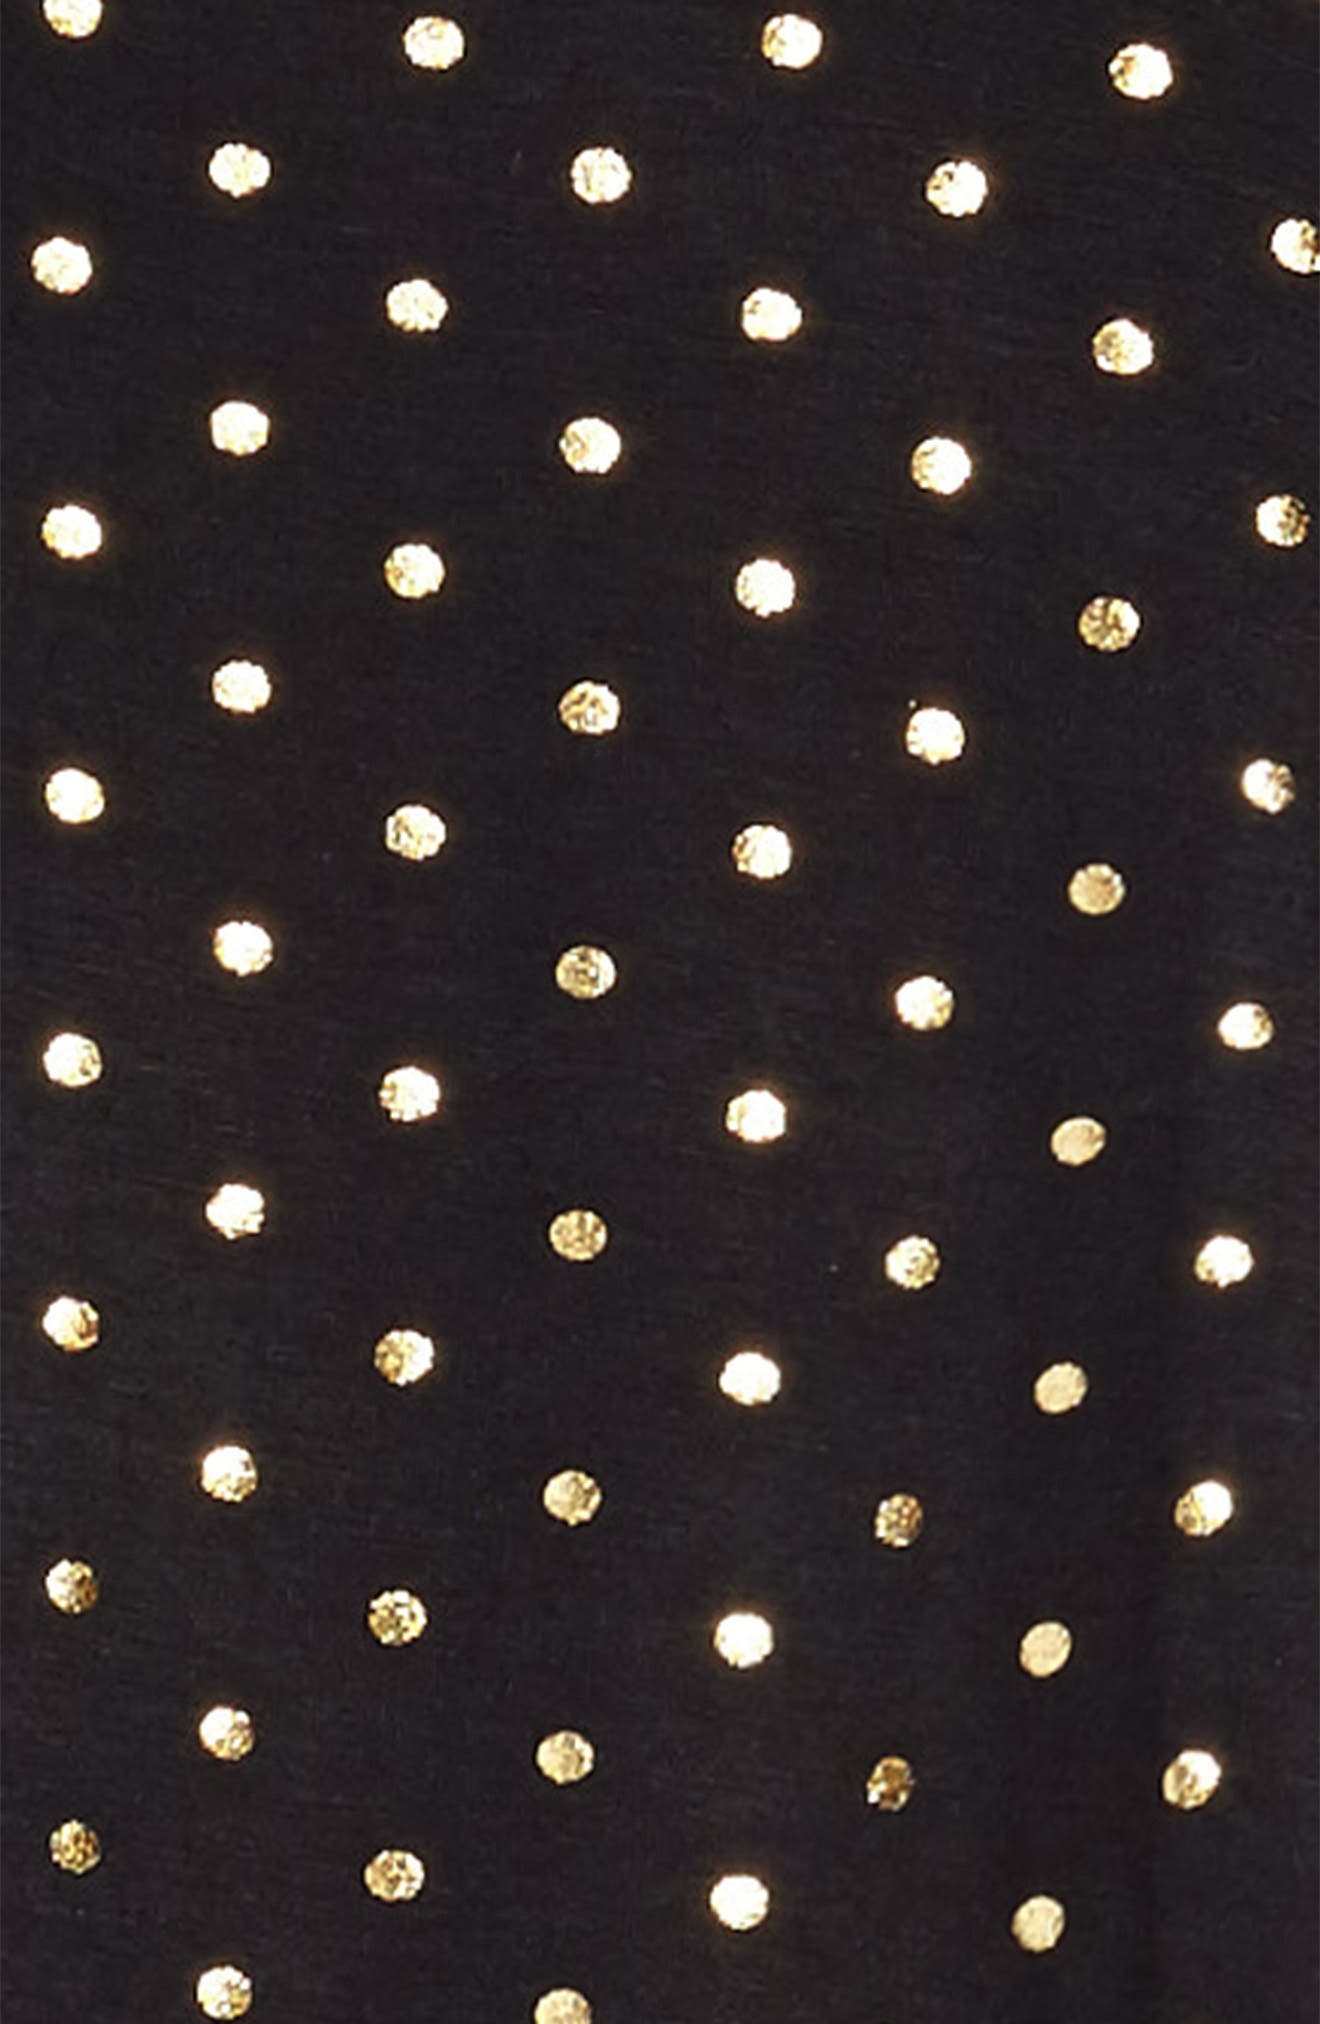 Foil Polka Dot Jersey Dress,                             Alternate thumbnail 3, color,                             005